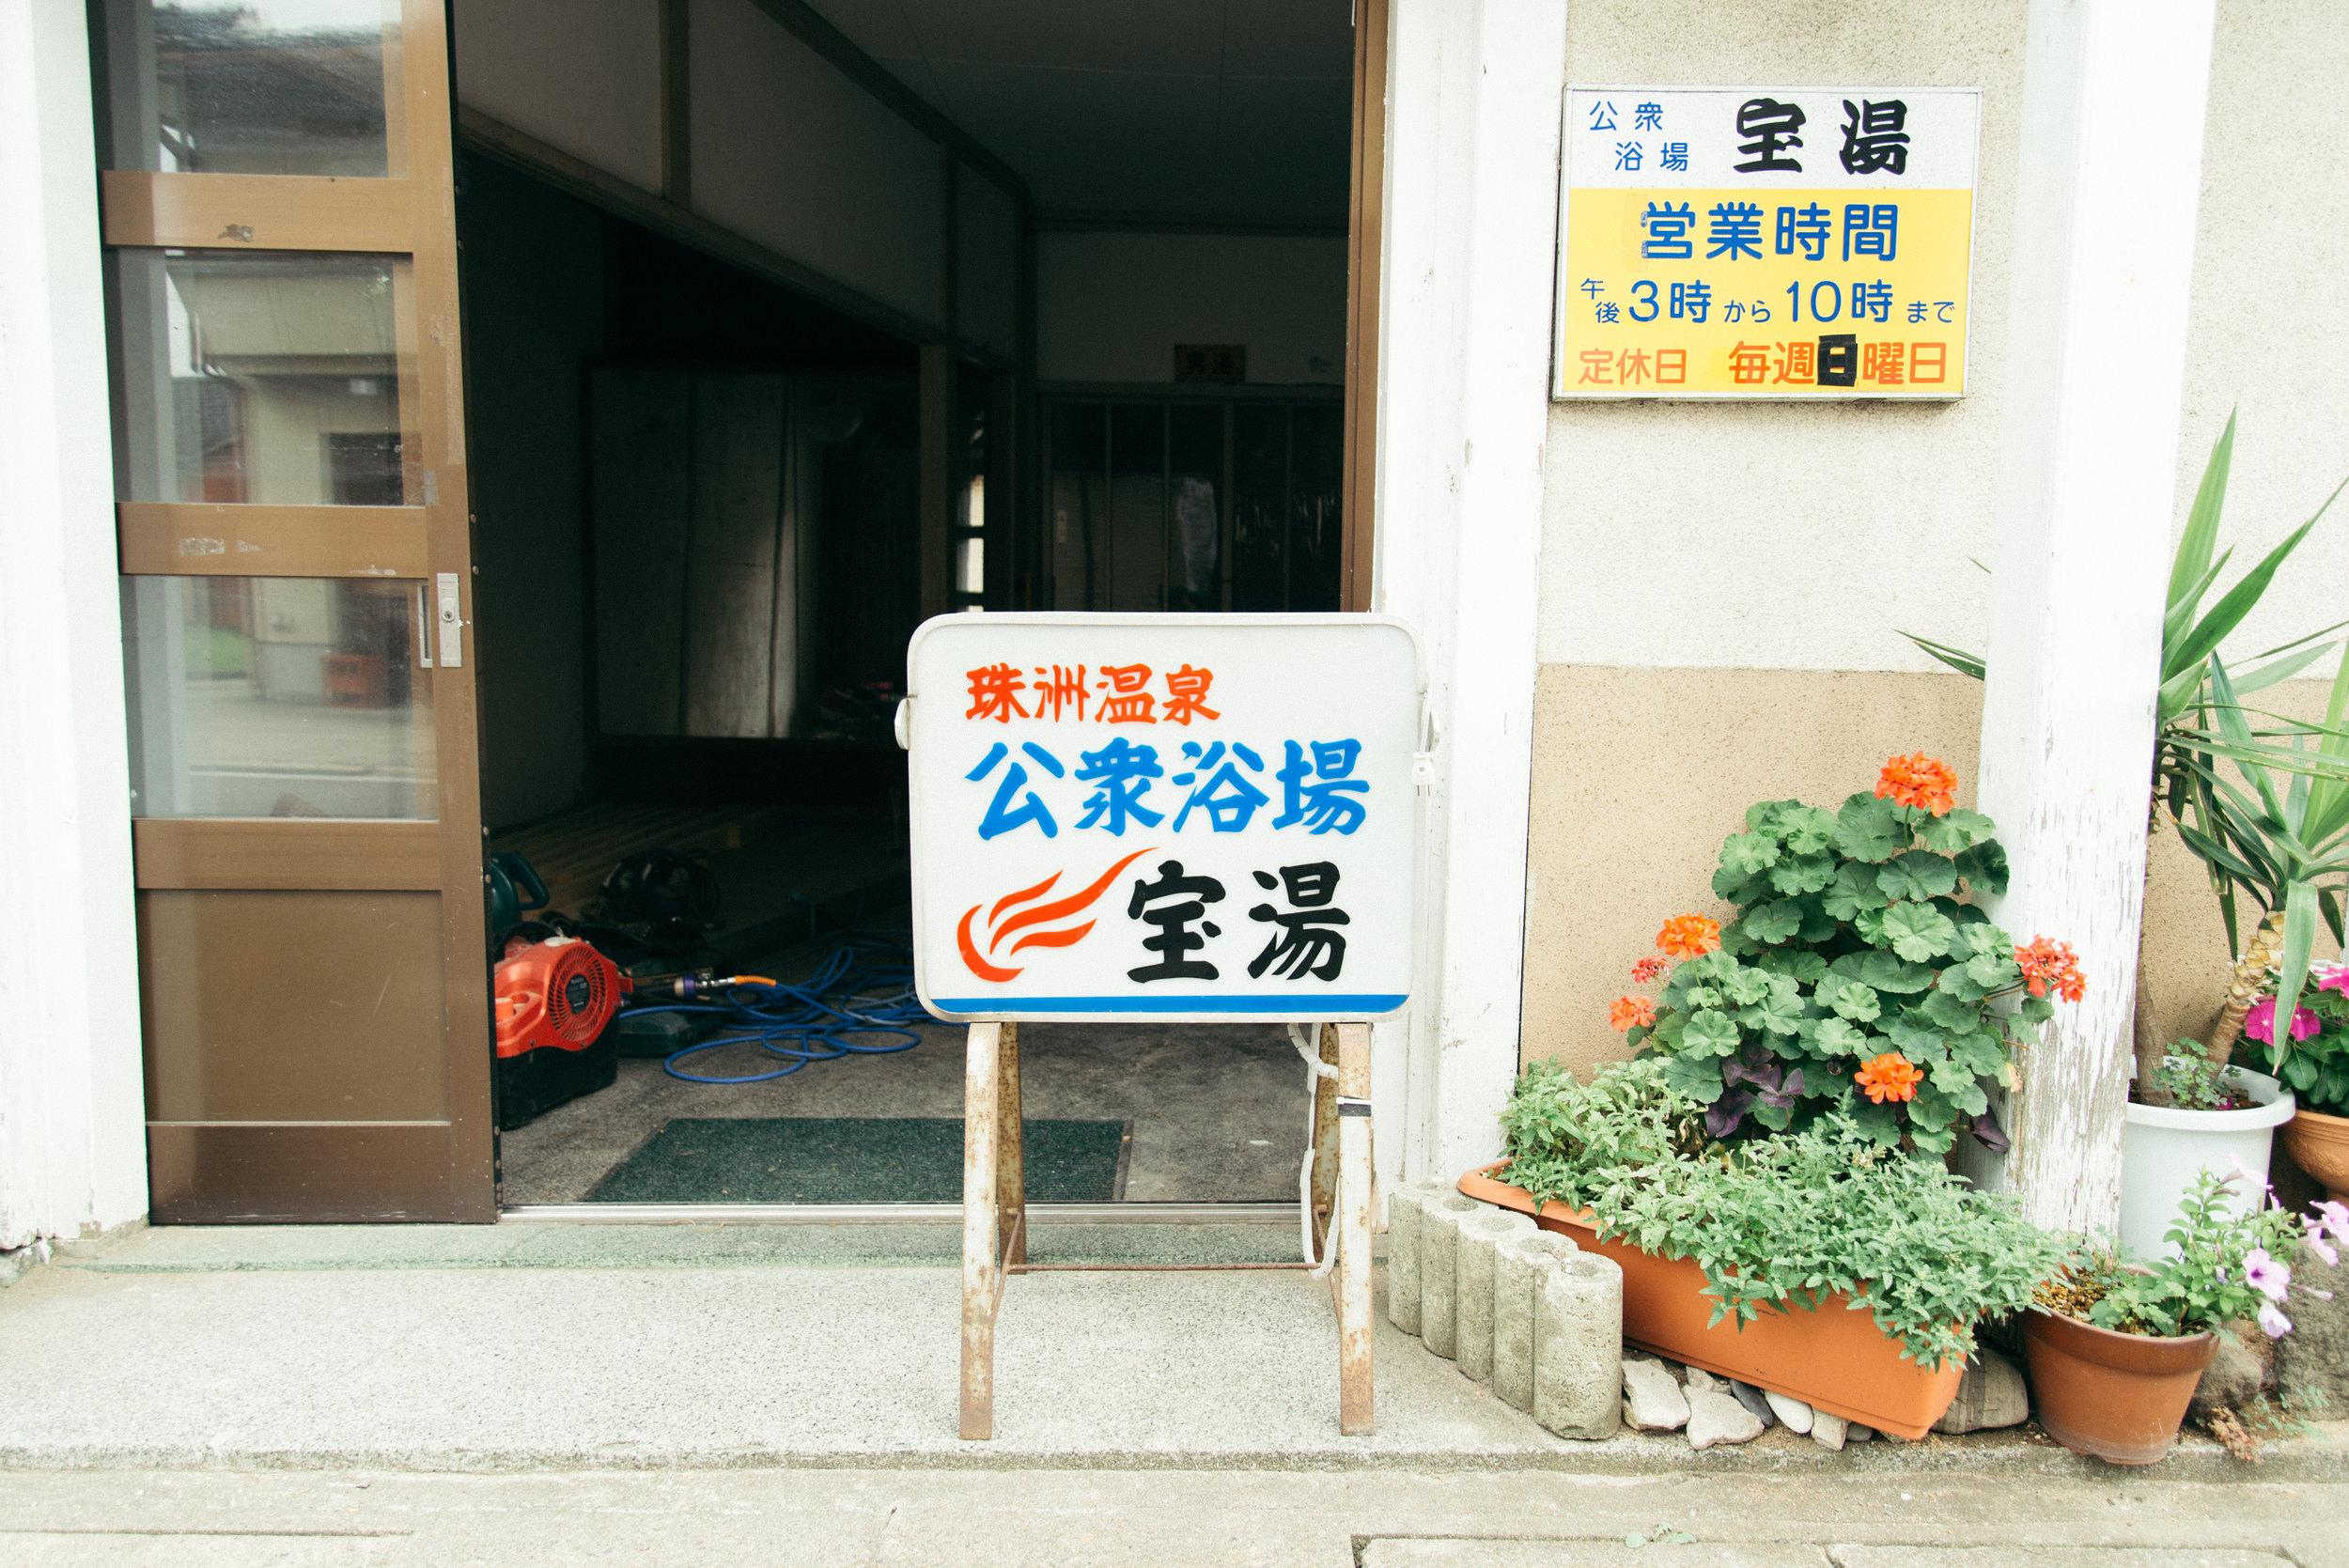 TYJ_2072.jpg